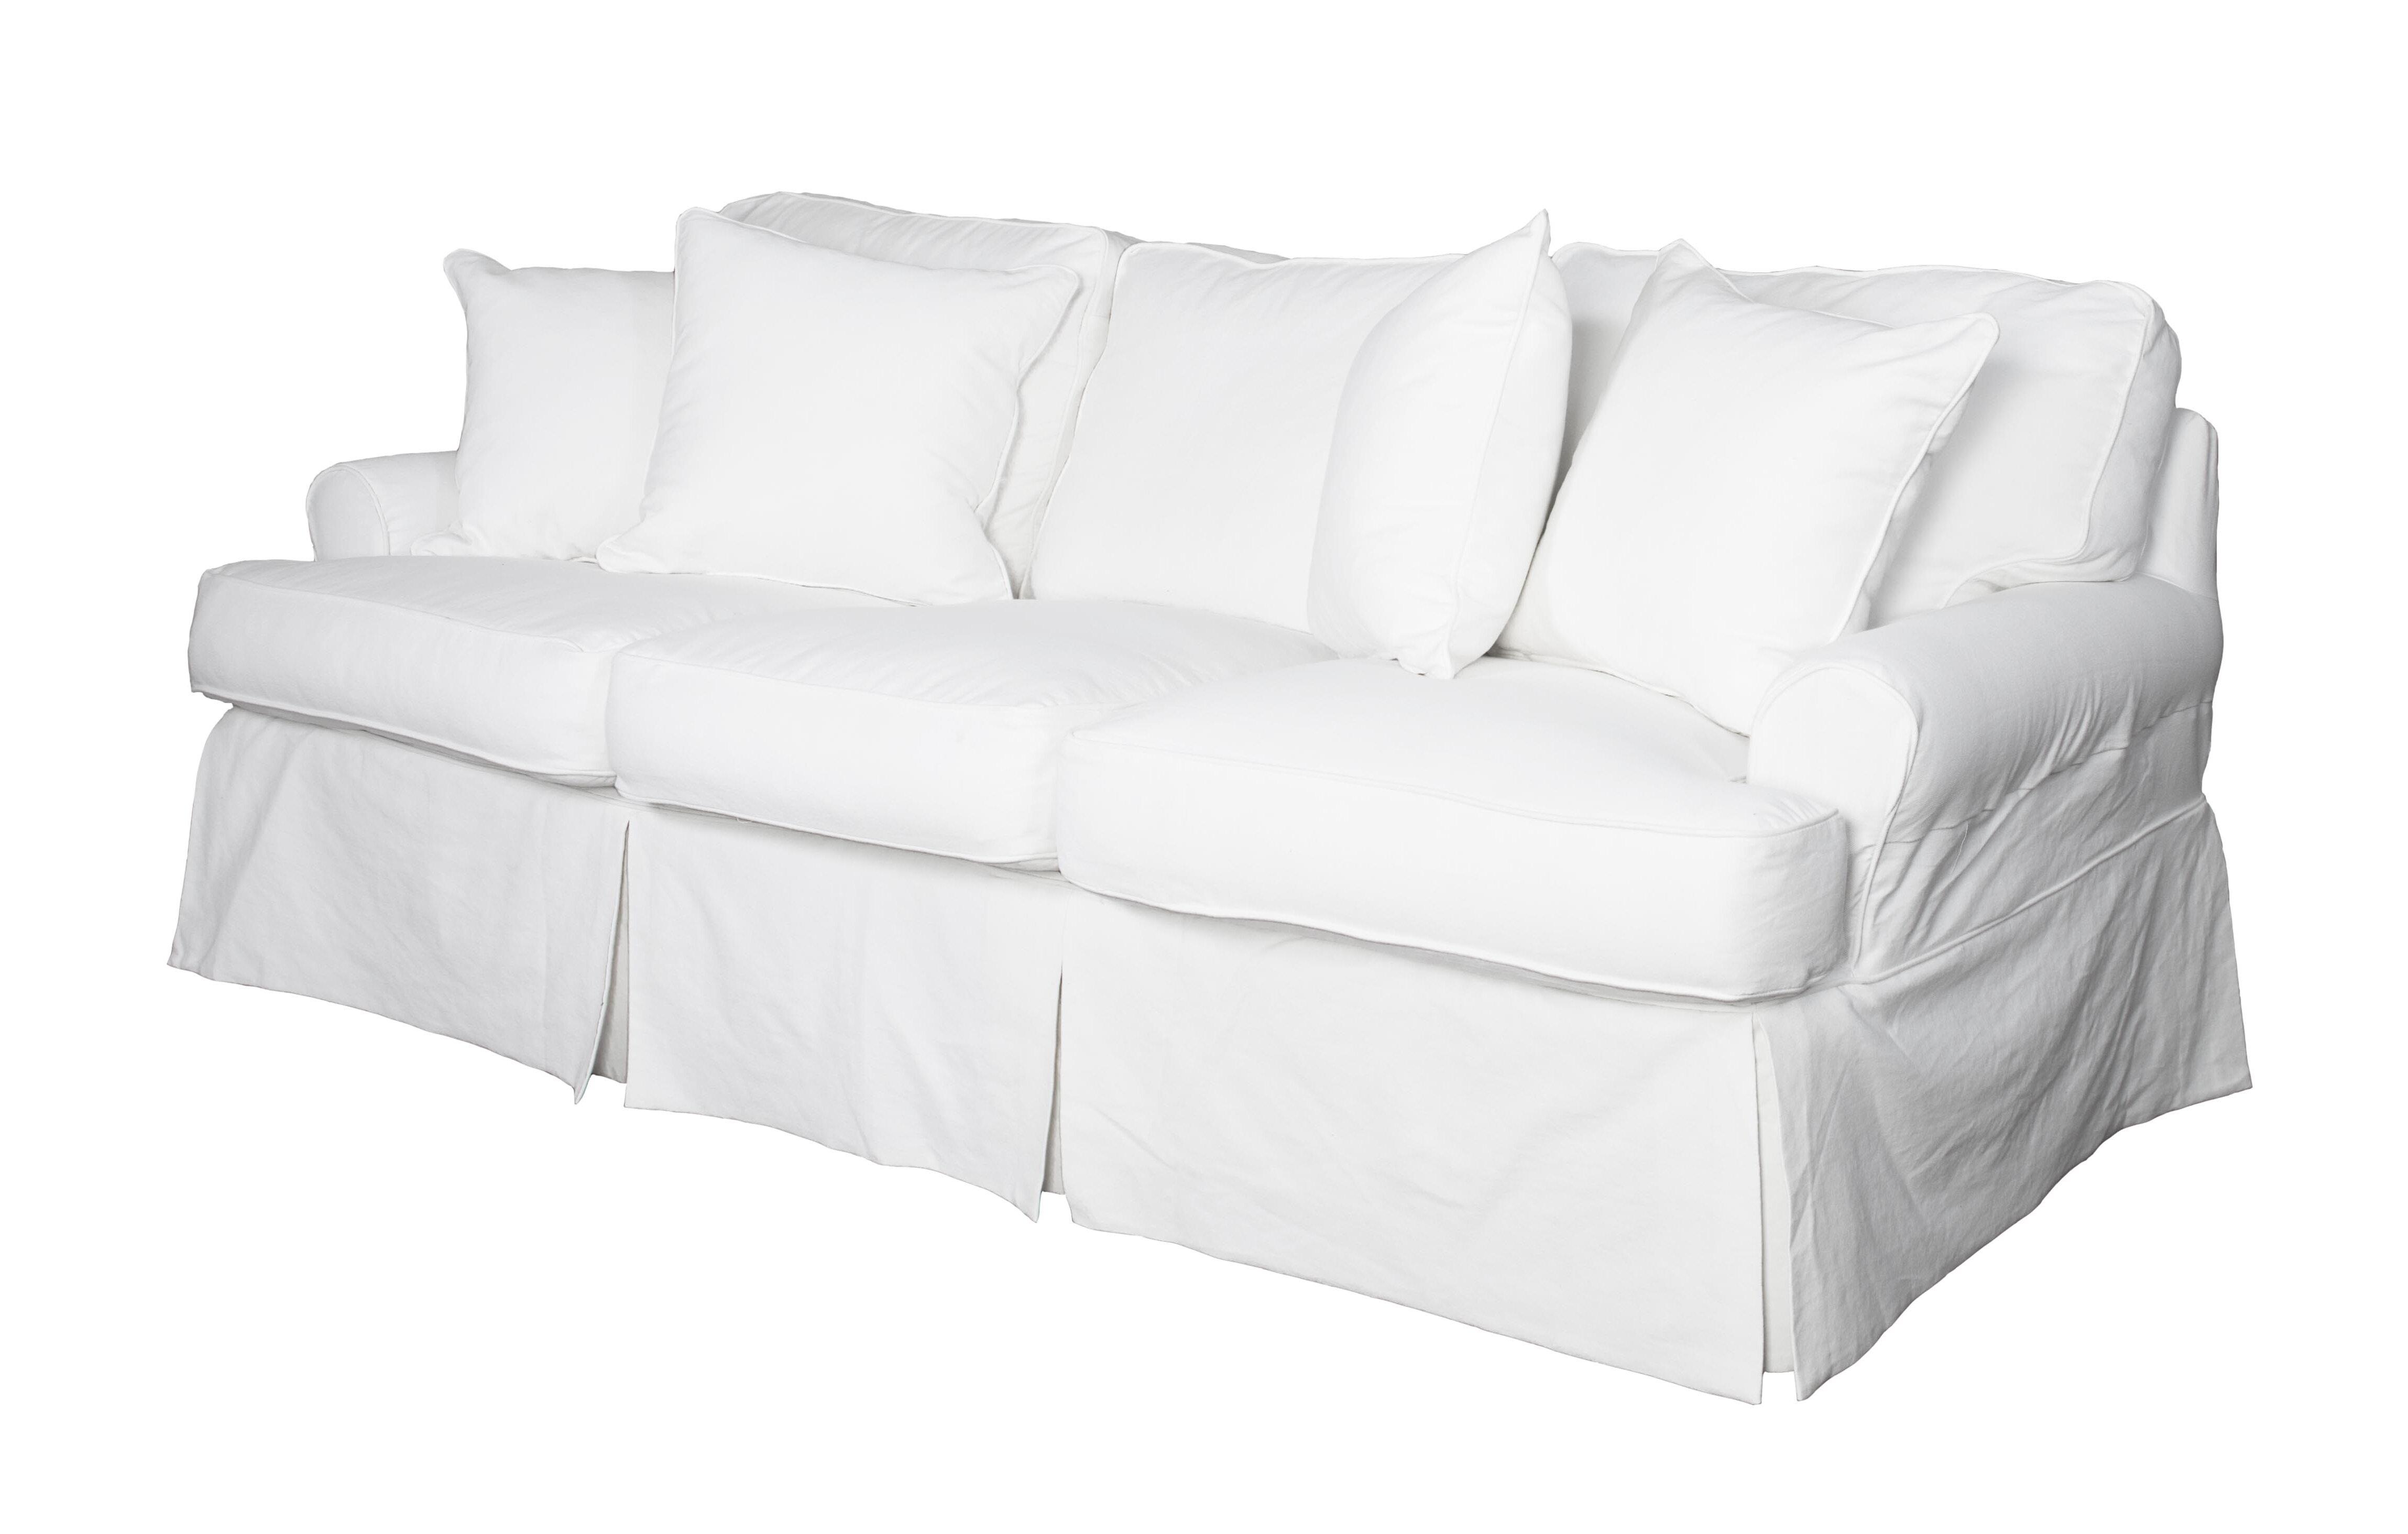 Beachcrest Home Rundle T-cushion Sofa Slipcover & Reviews | Wayfair